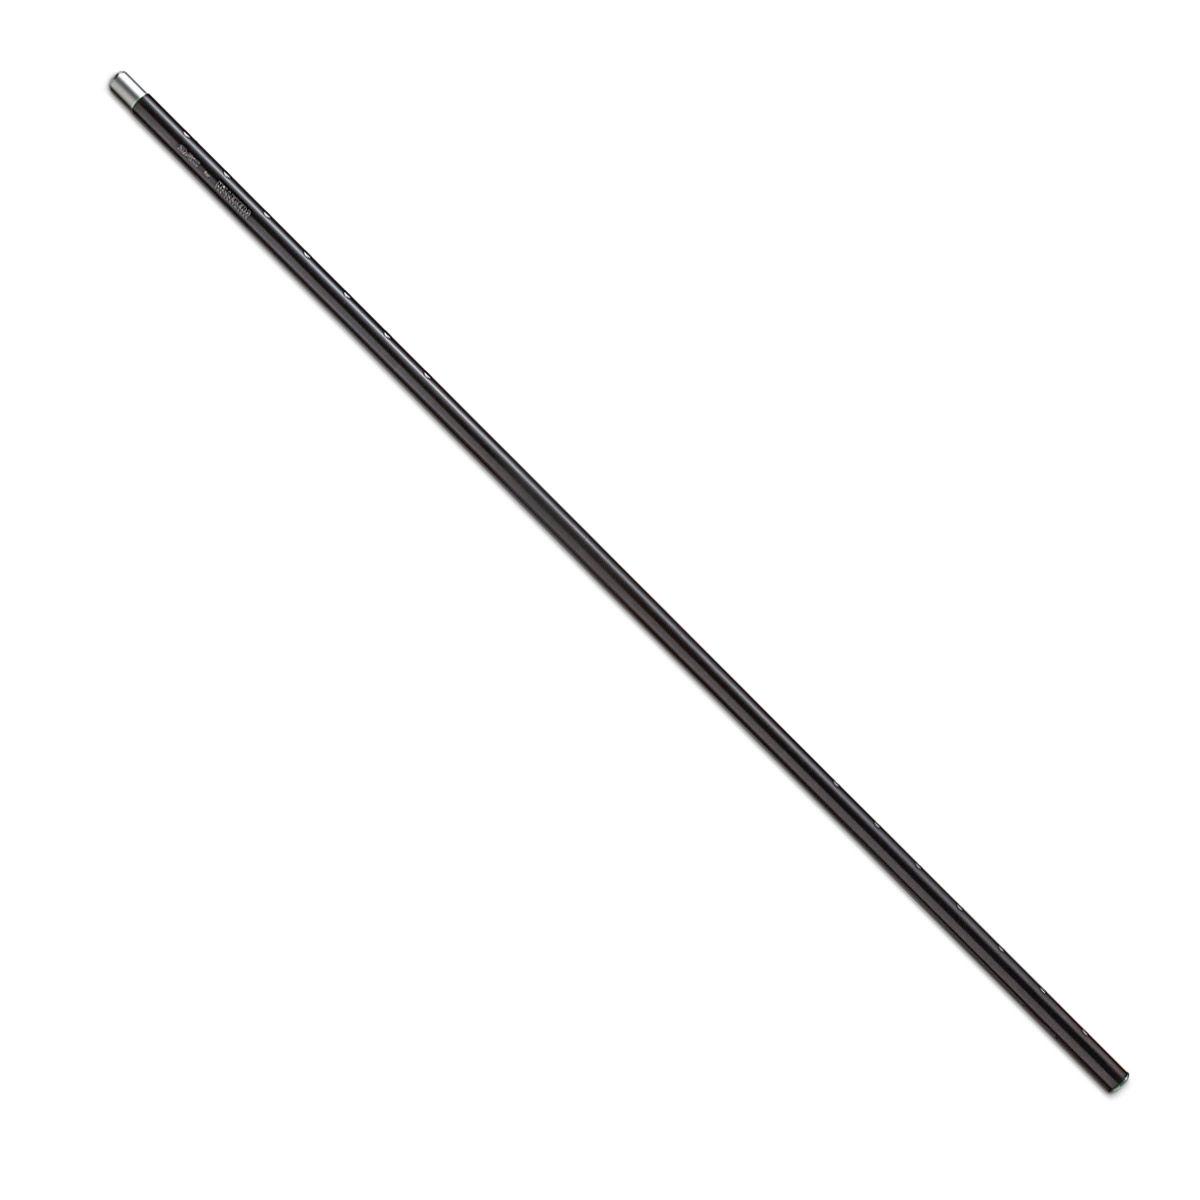 Hilleberg Tarp Pole 2.0